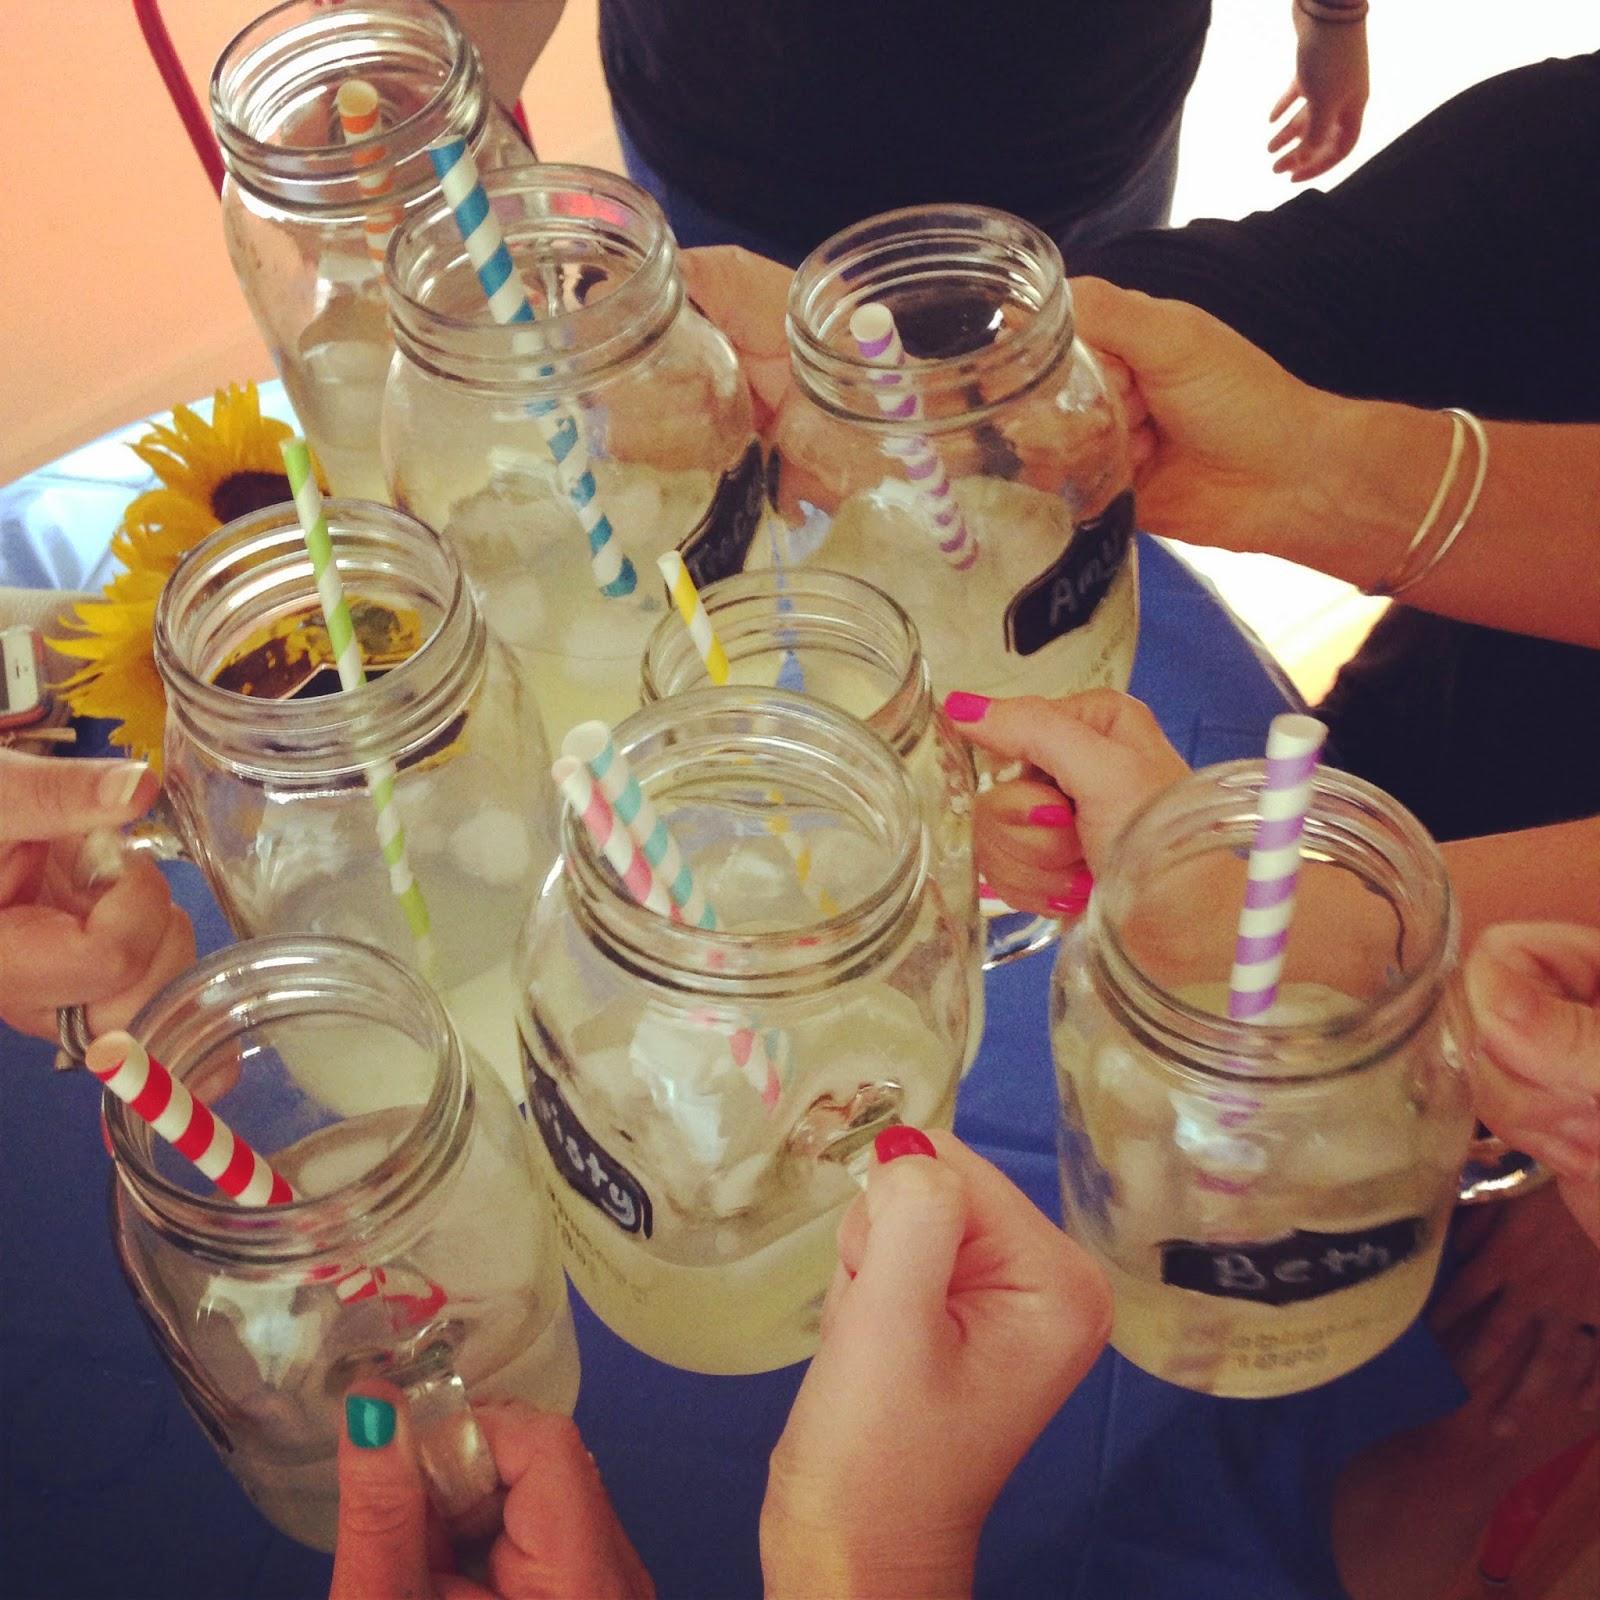 bachelorette party, bachelorette weekend, bachelorette party favors, mason jars